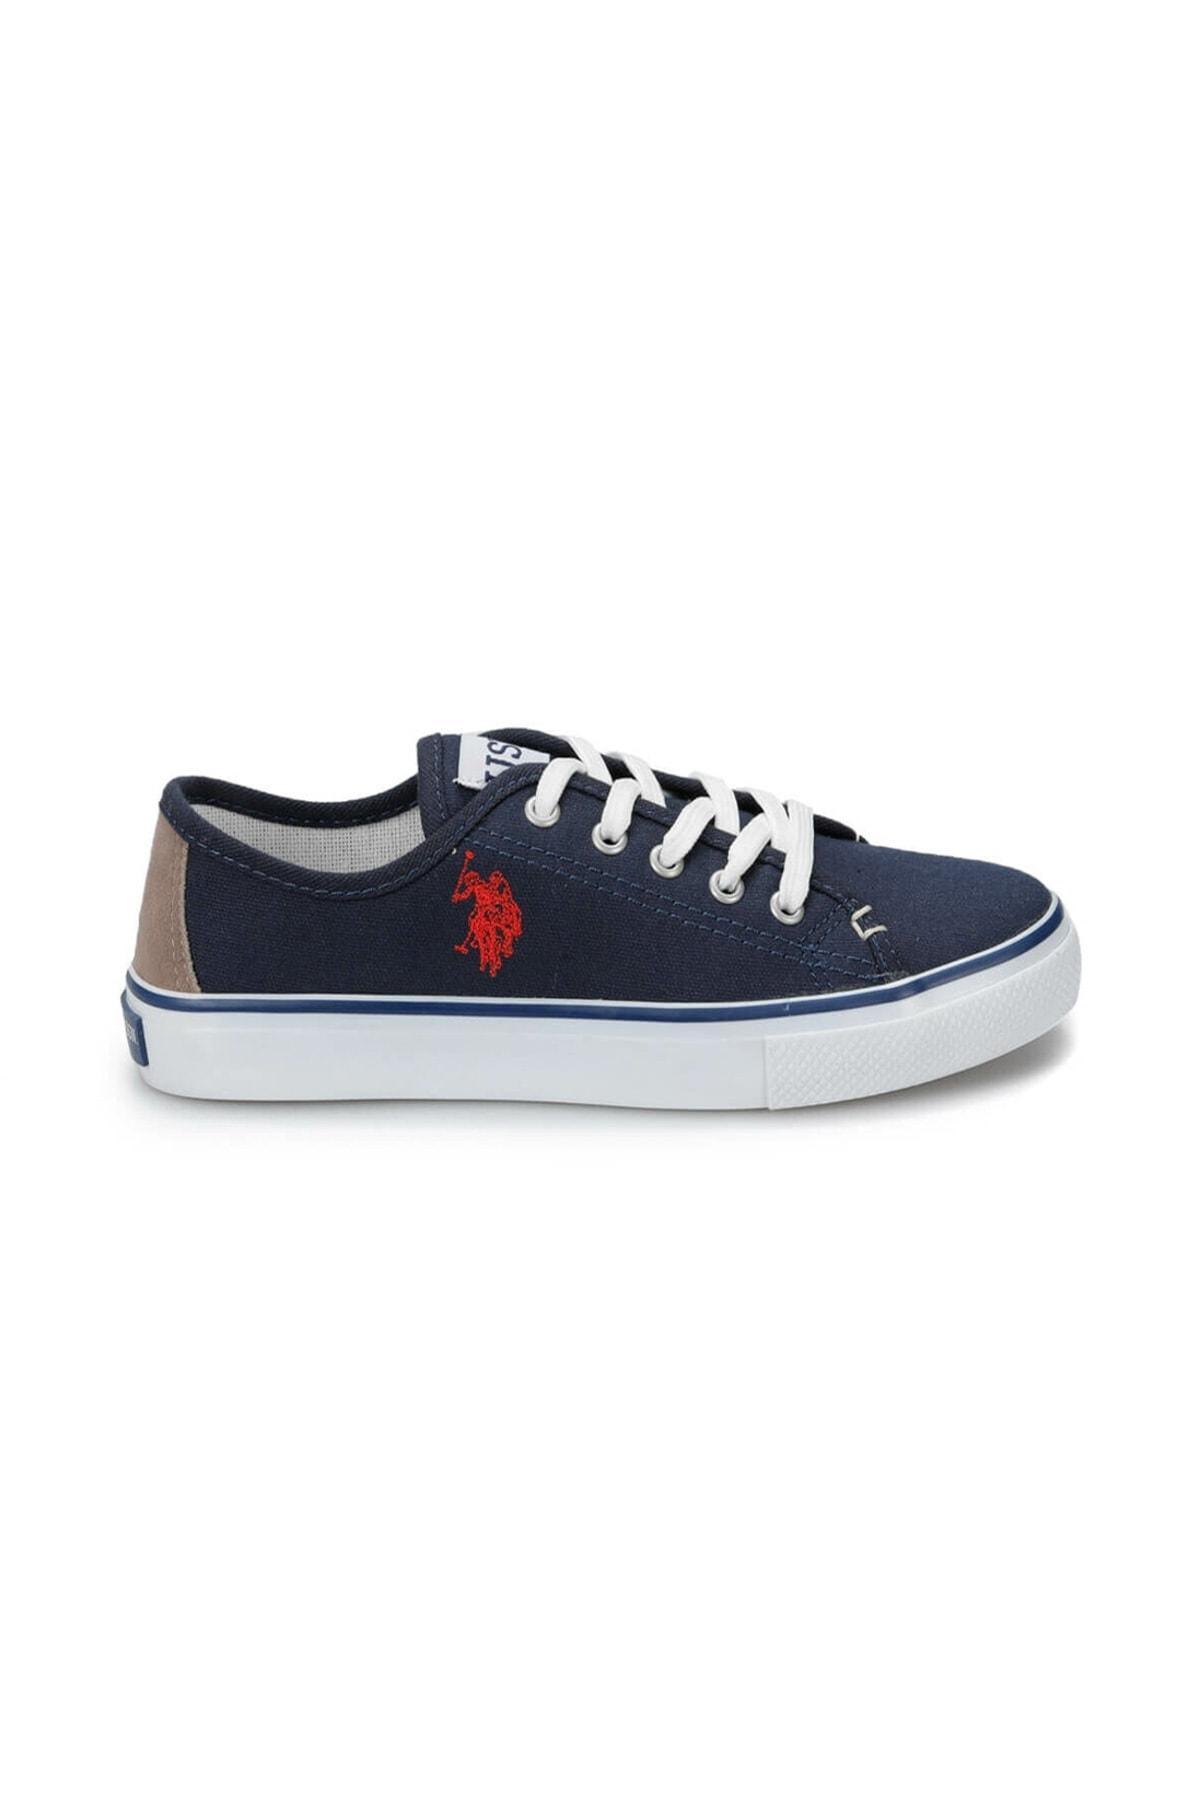 U.S. Polo Assn. Ayakkabı 2